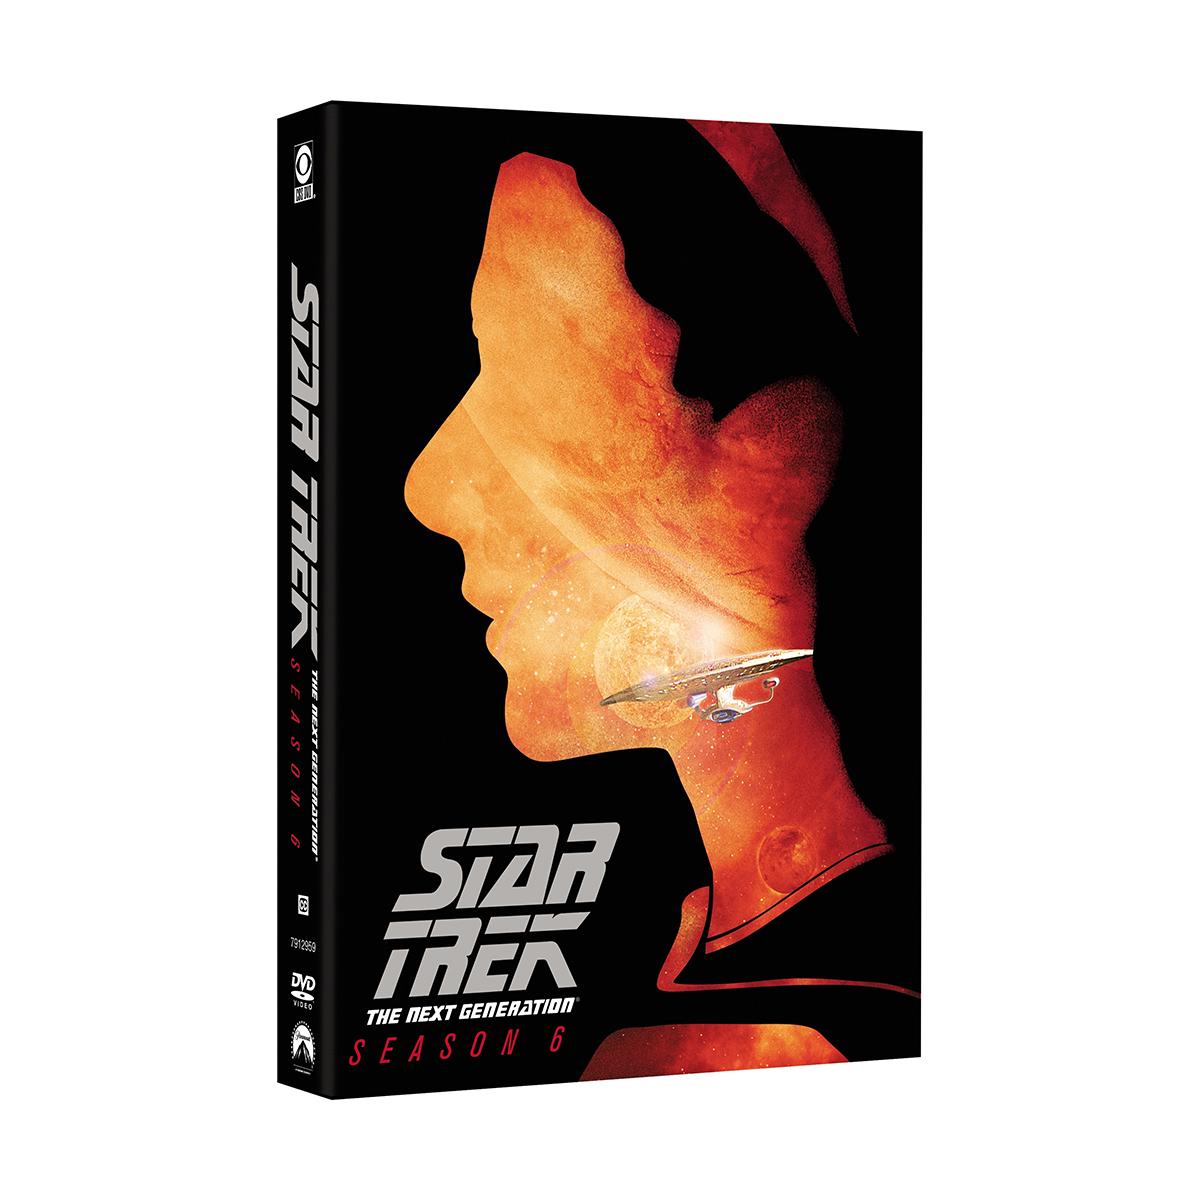 Star Trek: The Next Generation - Season 6 DVD